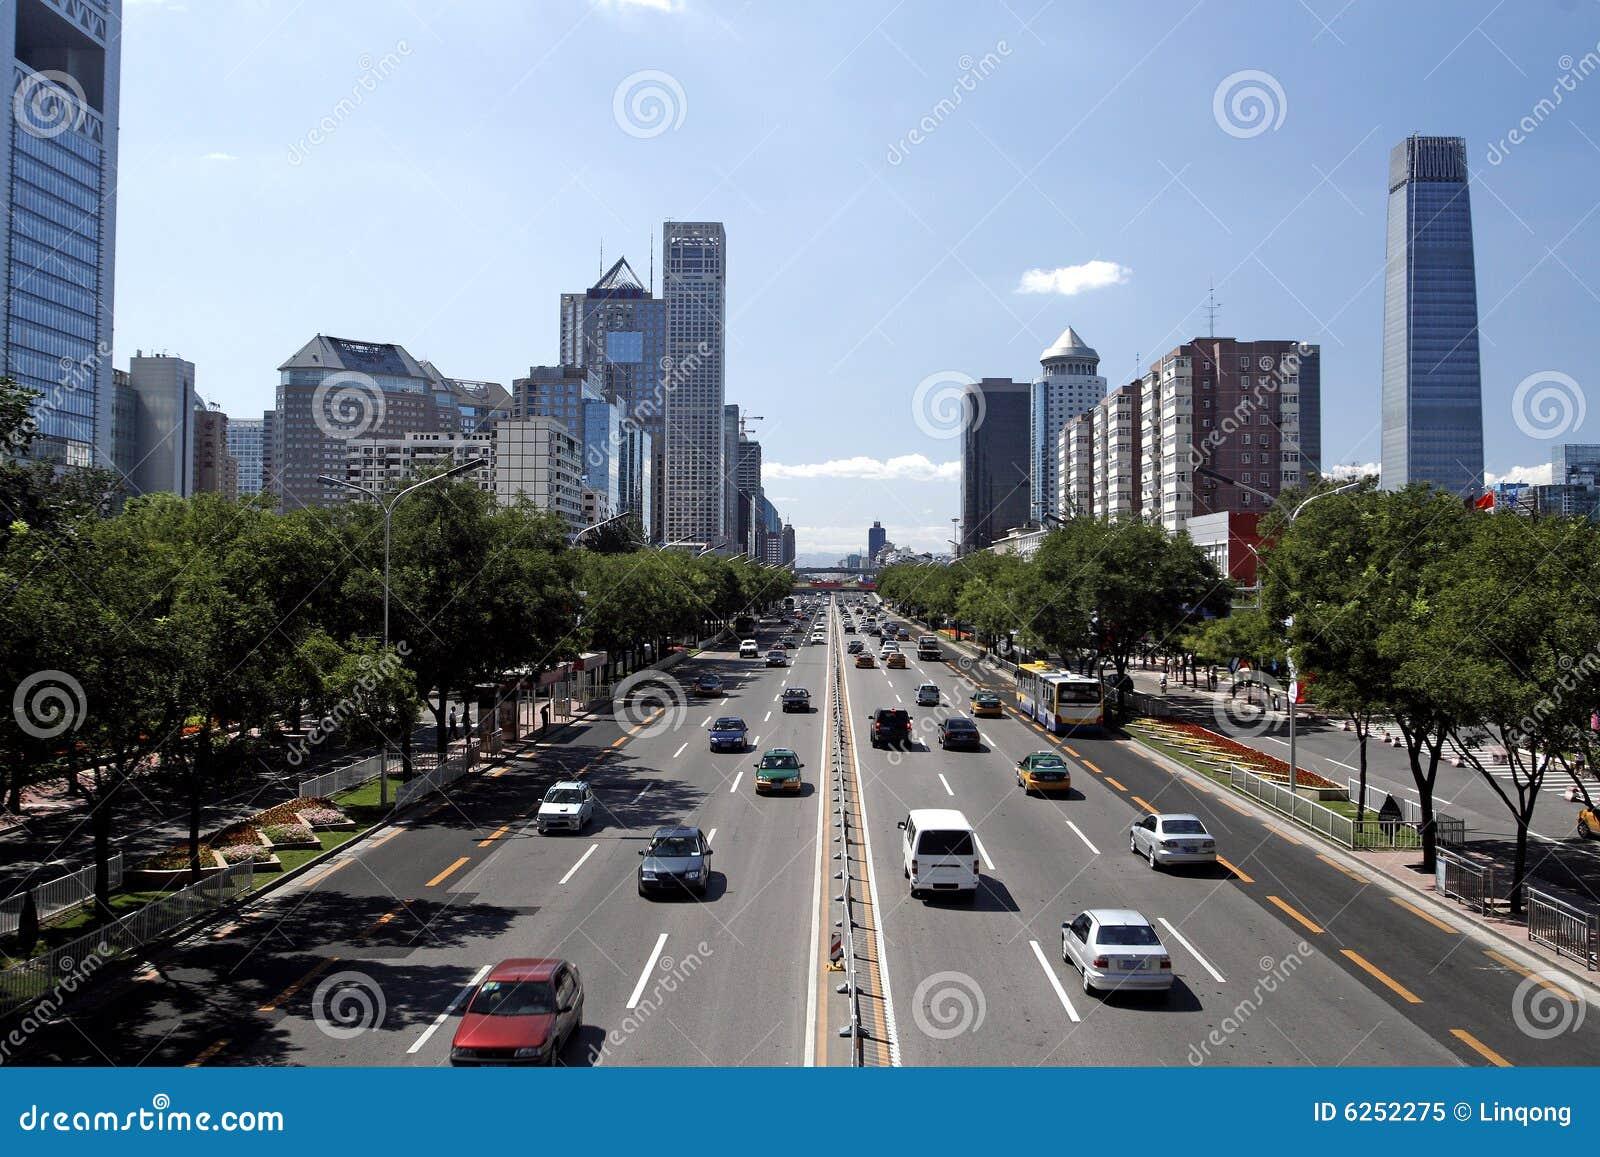 Car Building Games >> Beijing's Urban Streetscape Stock Image - Image: 6252275